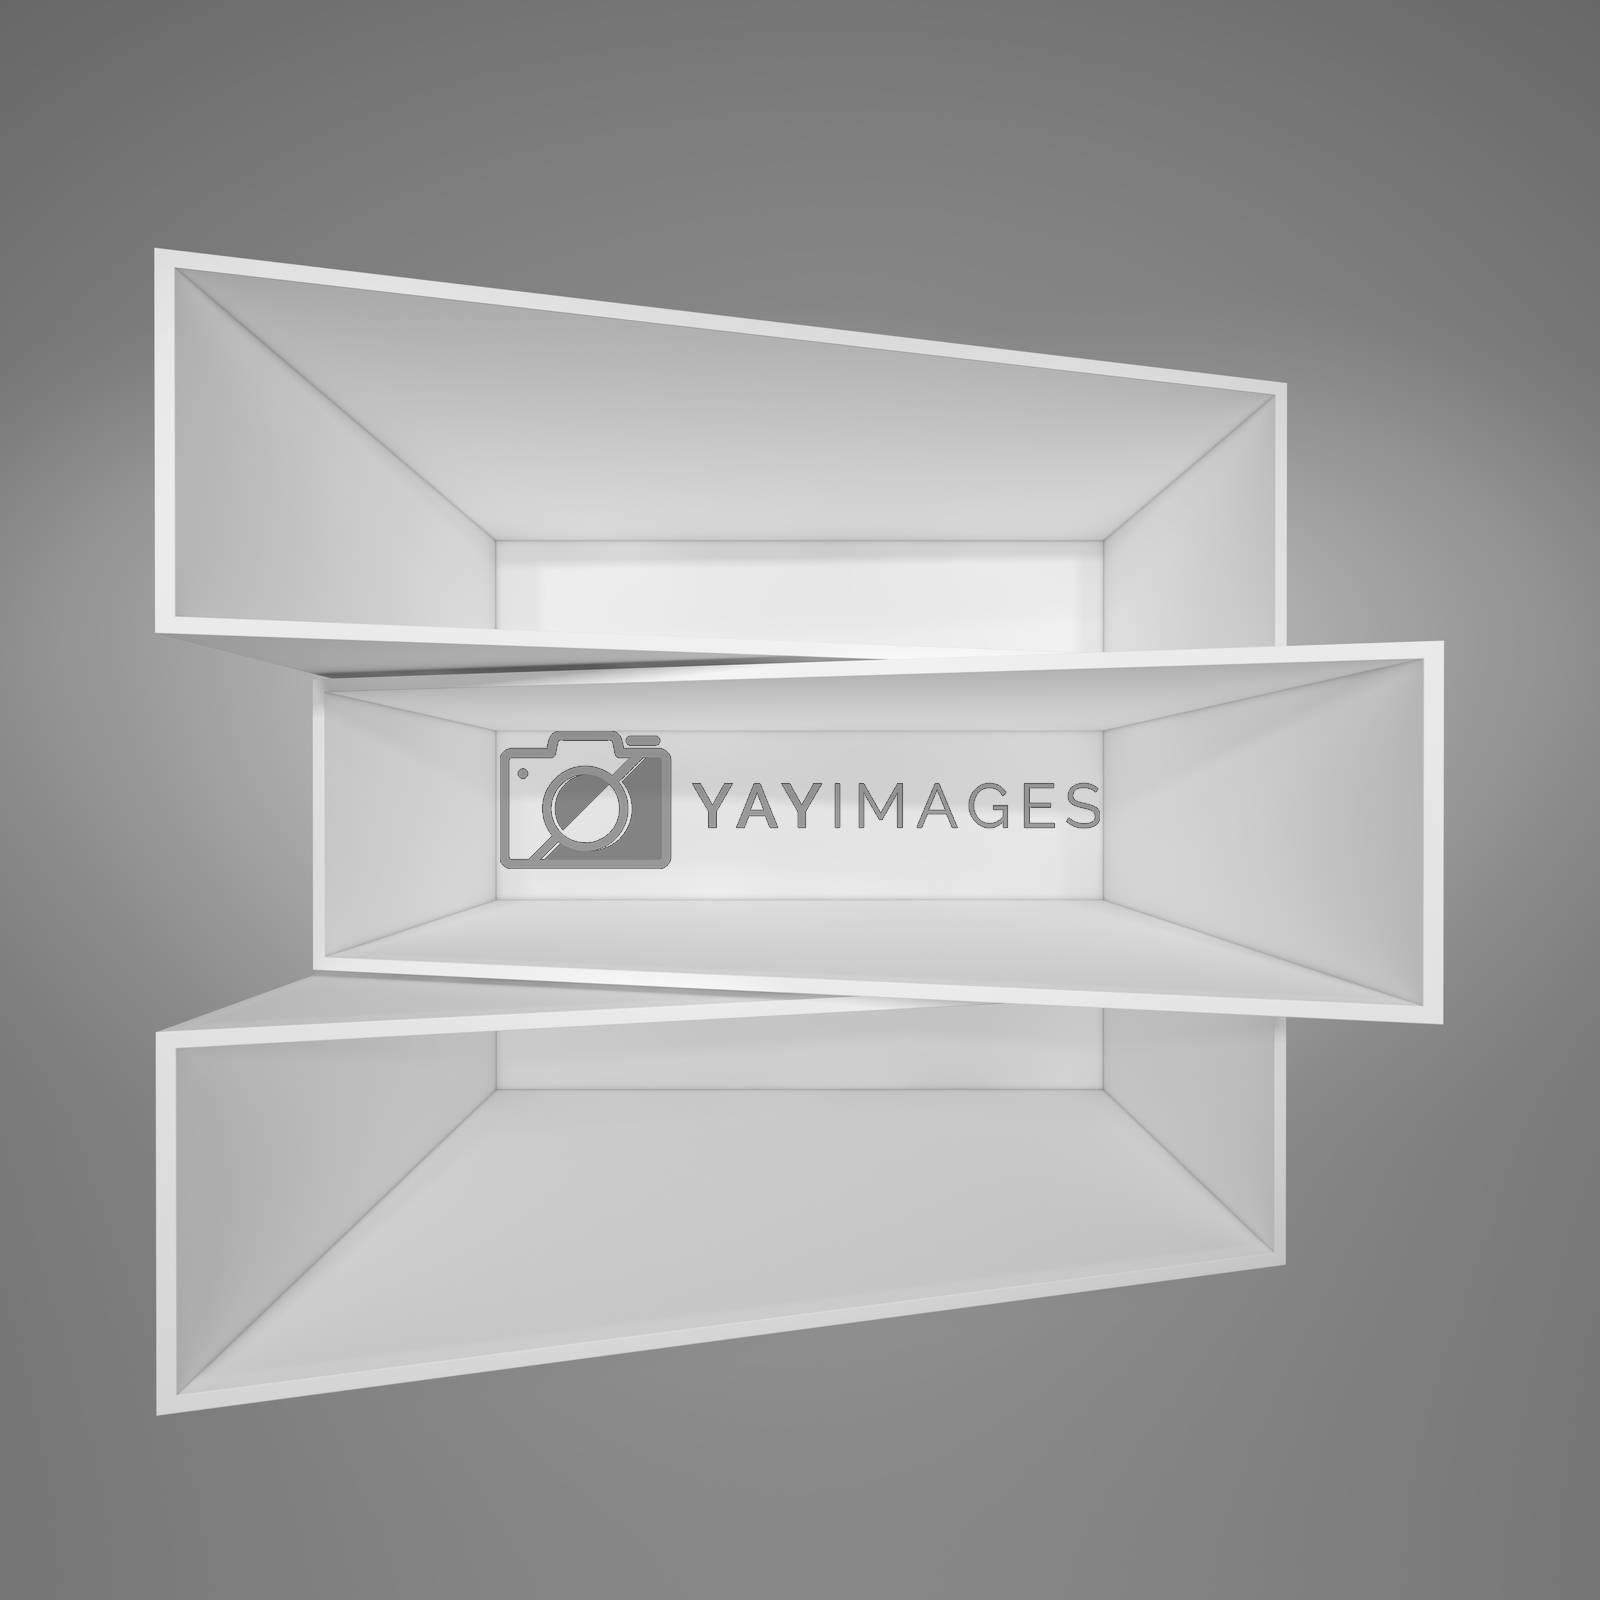 Illuminated white shelf for presentations. Gray background. 3D illustration